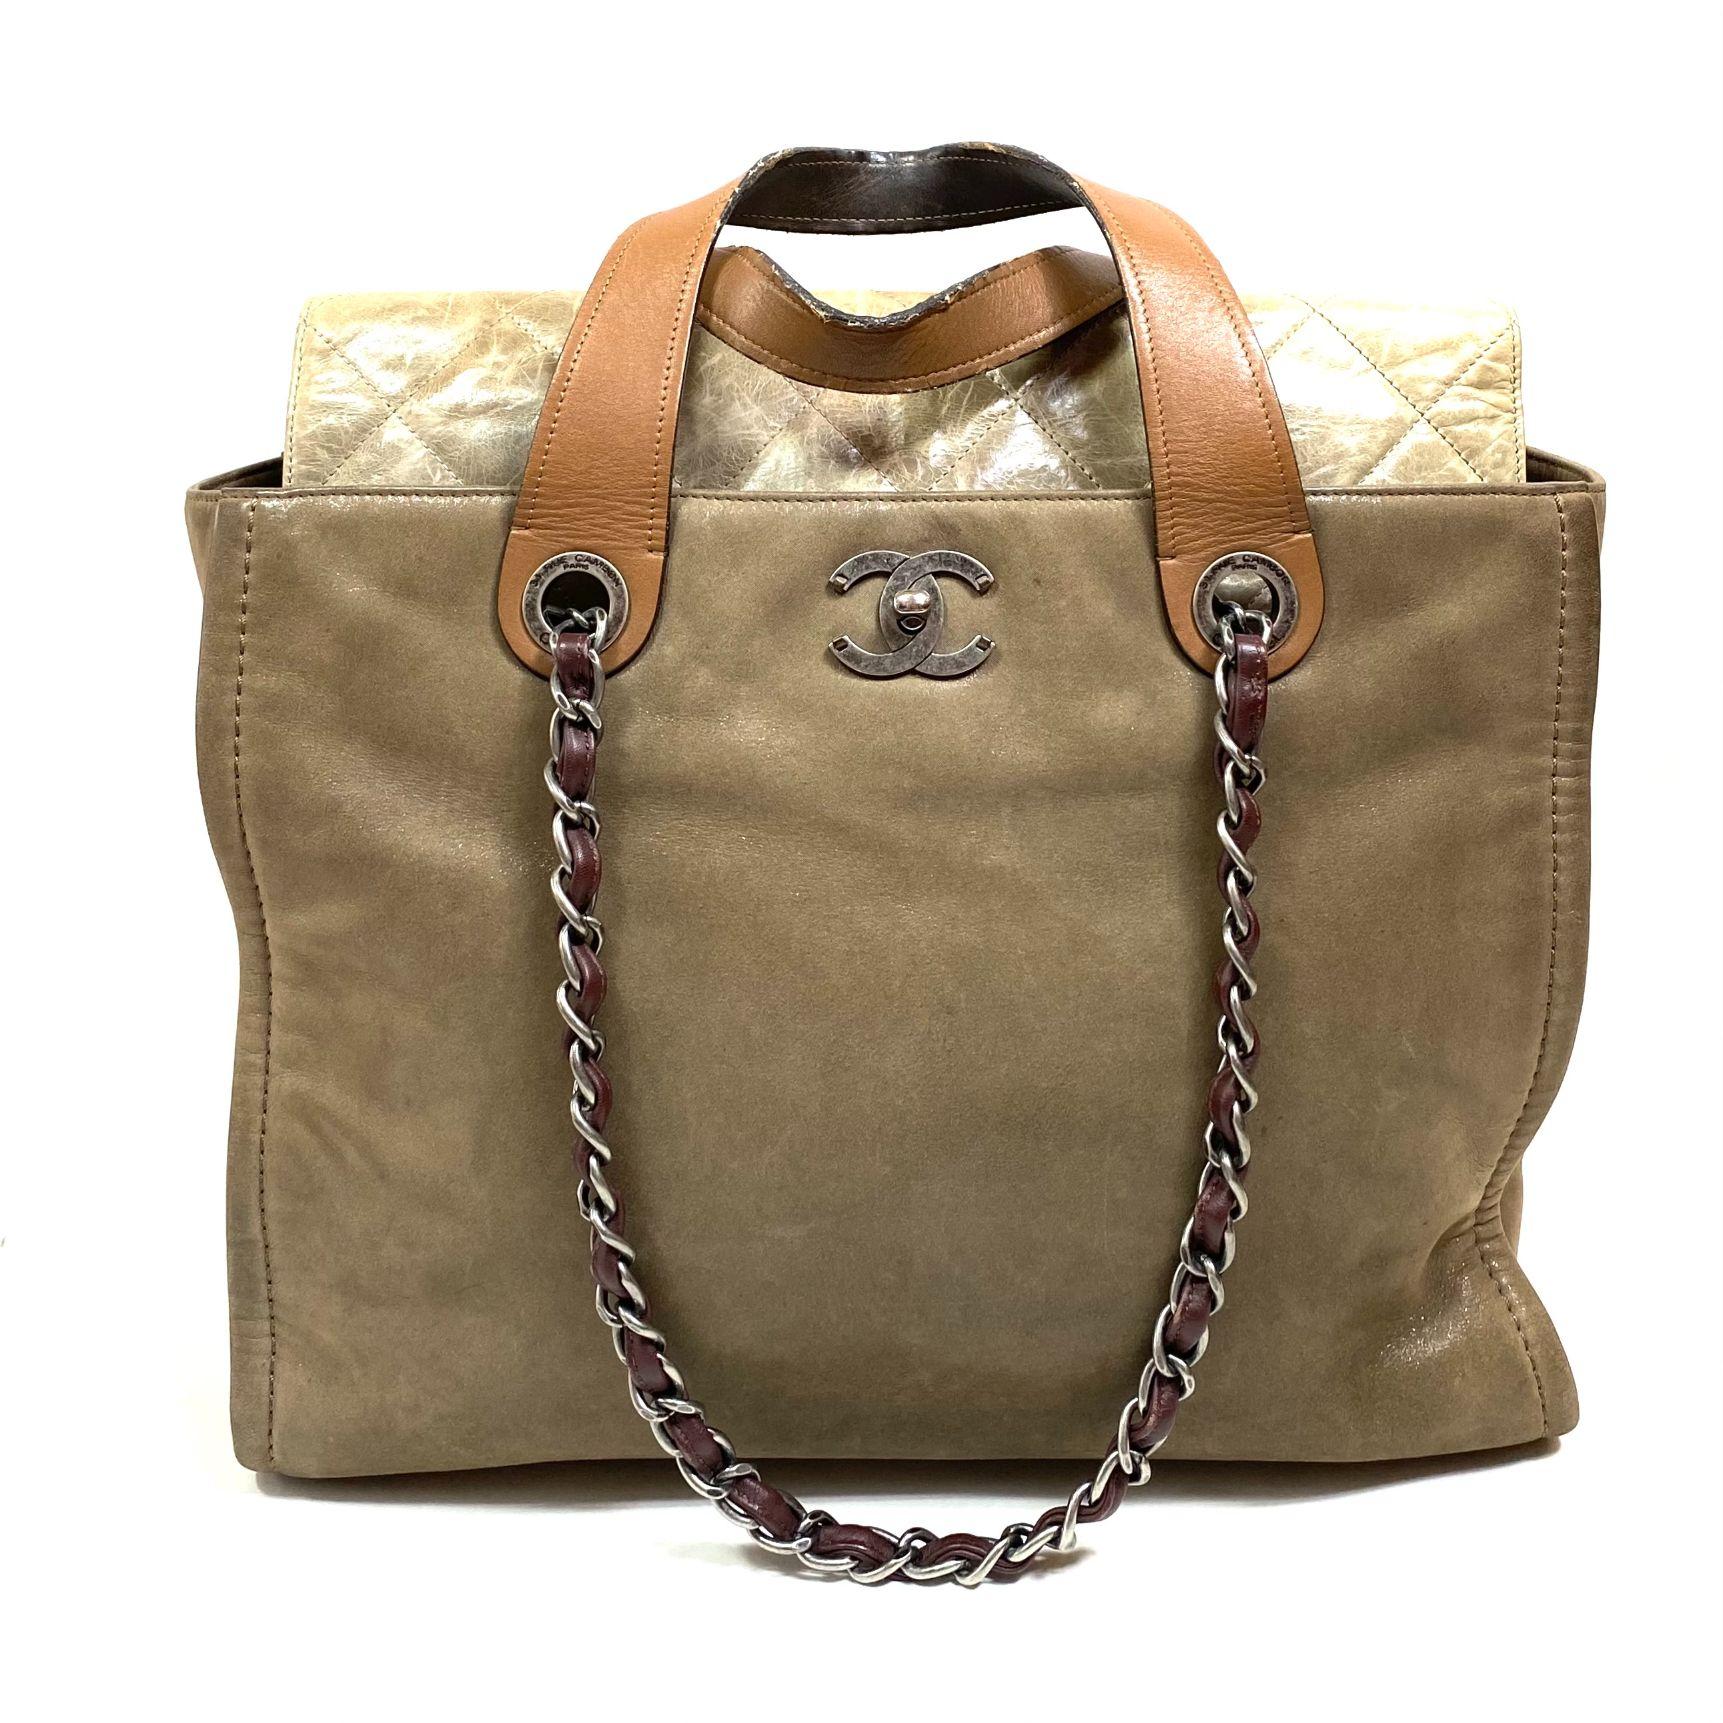 Bolsa Chanel Tote Beige